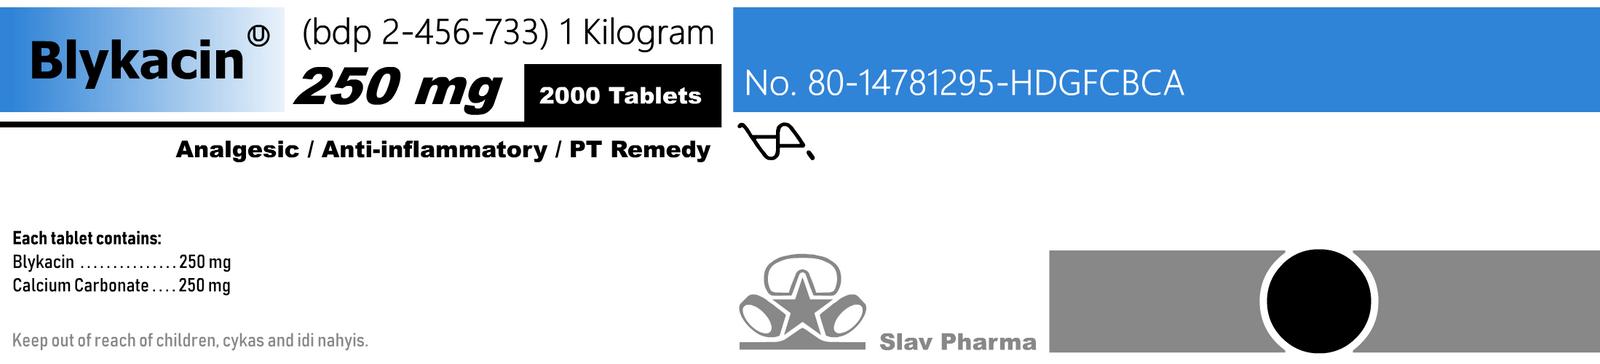 Terrahyptian Drug Labels (Blykacin) by SYRSA